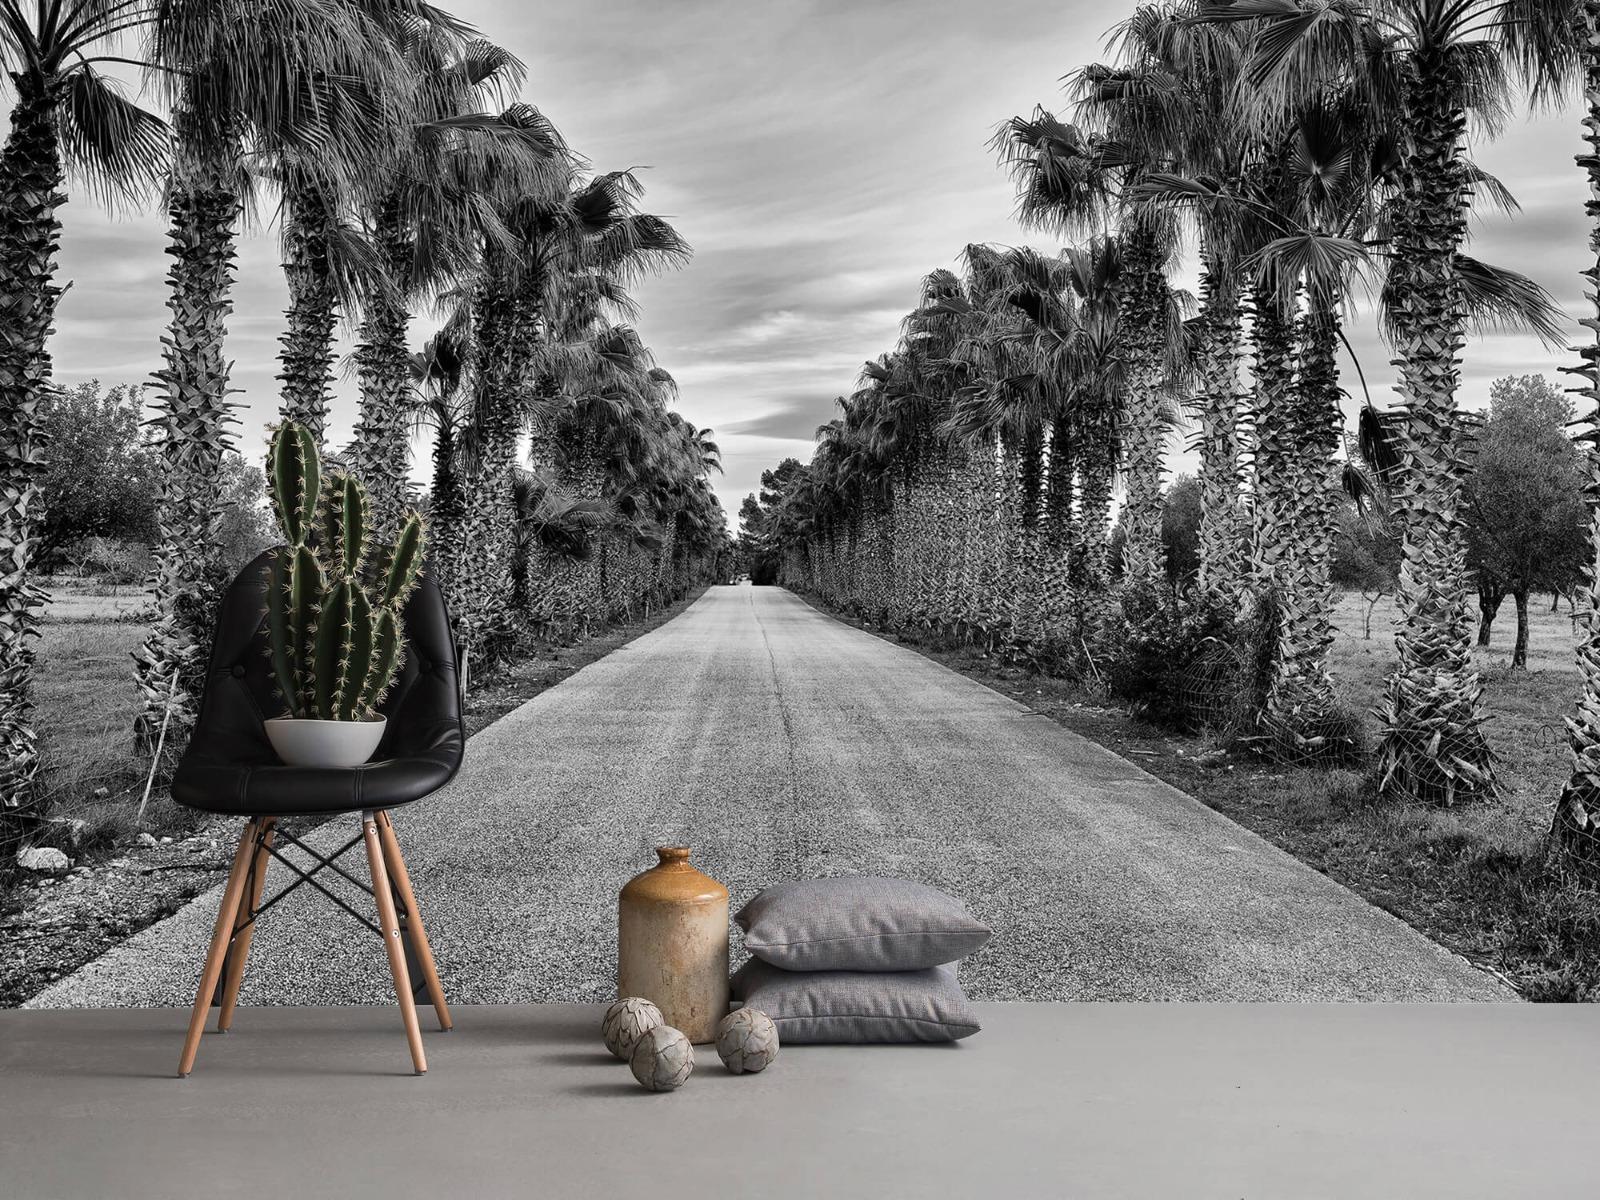 Palmbomen - Straat met palmbomen - Woonkamer 13